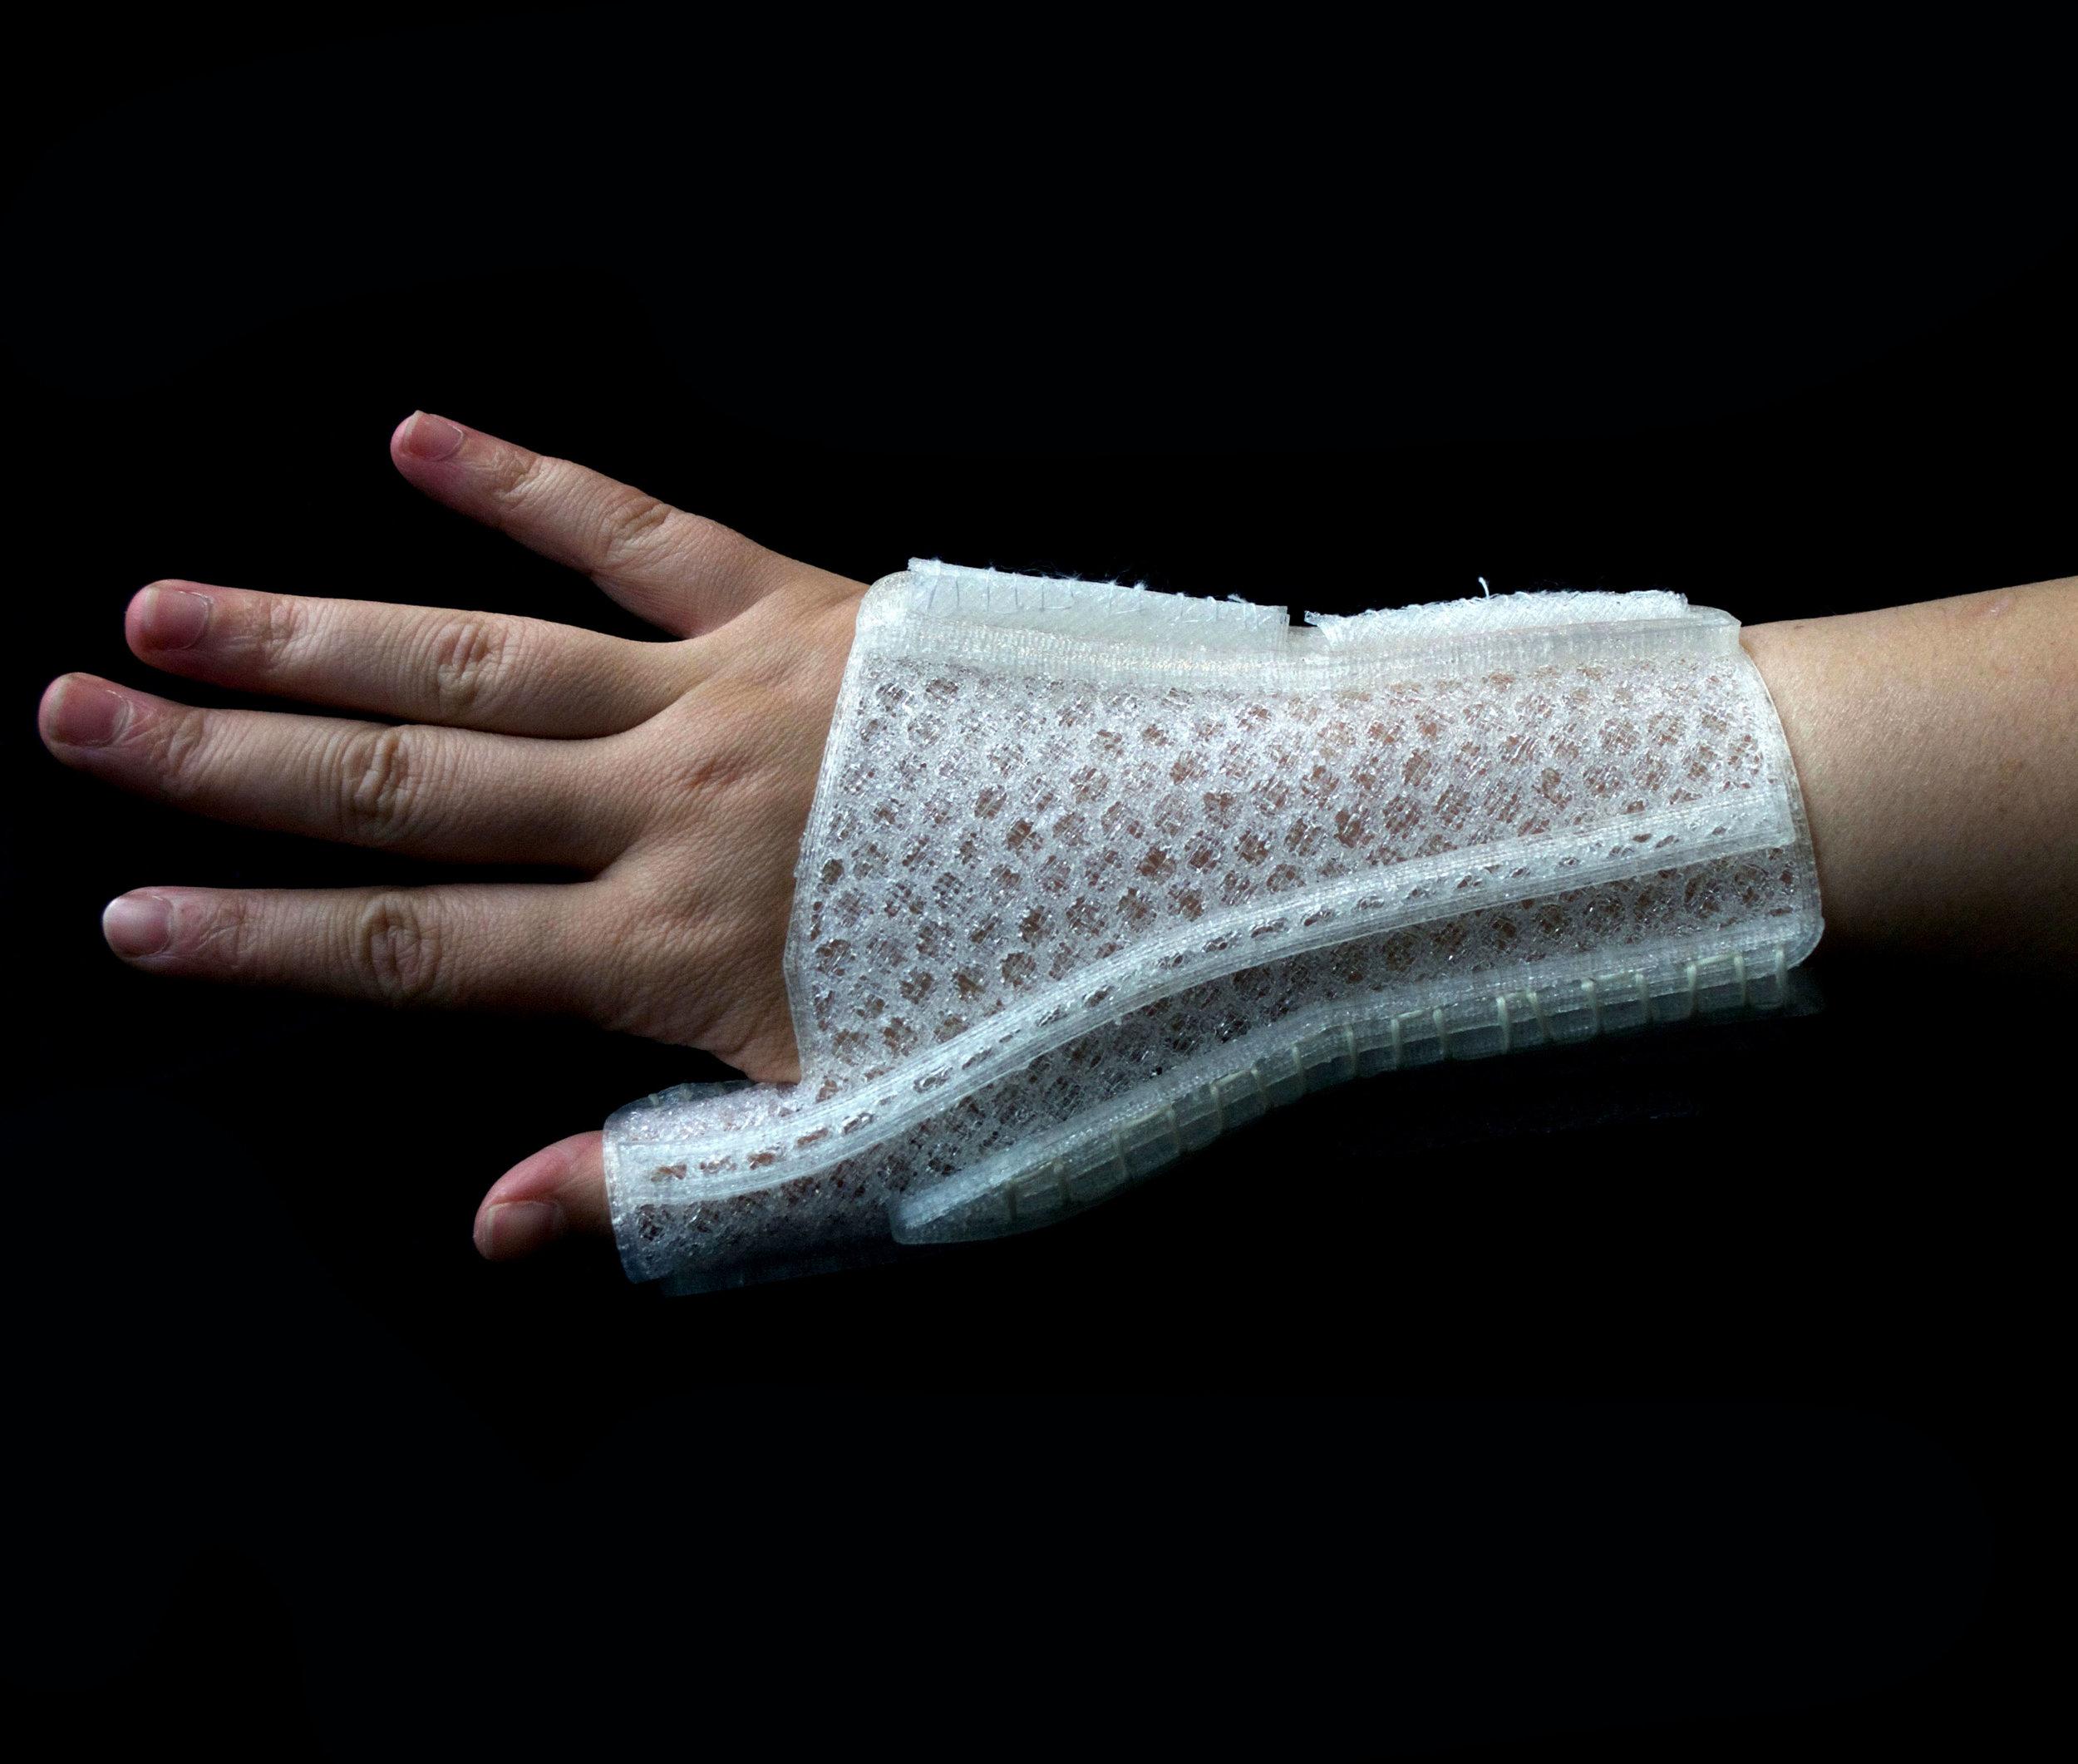 AERA: A Custom, 3D Printed Medical Support Wrist Brace for Gardeners